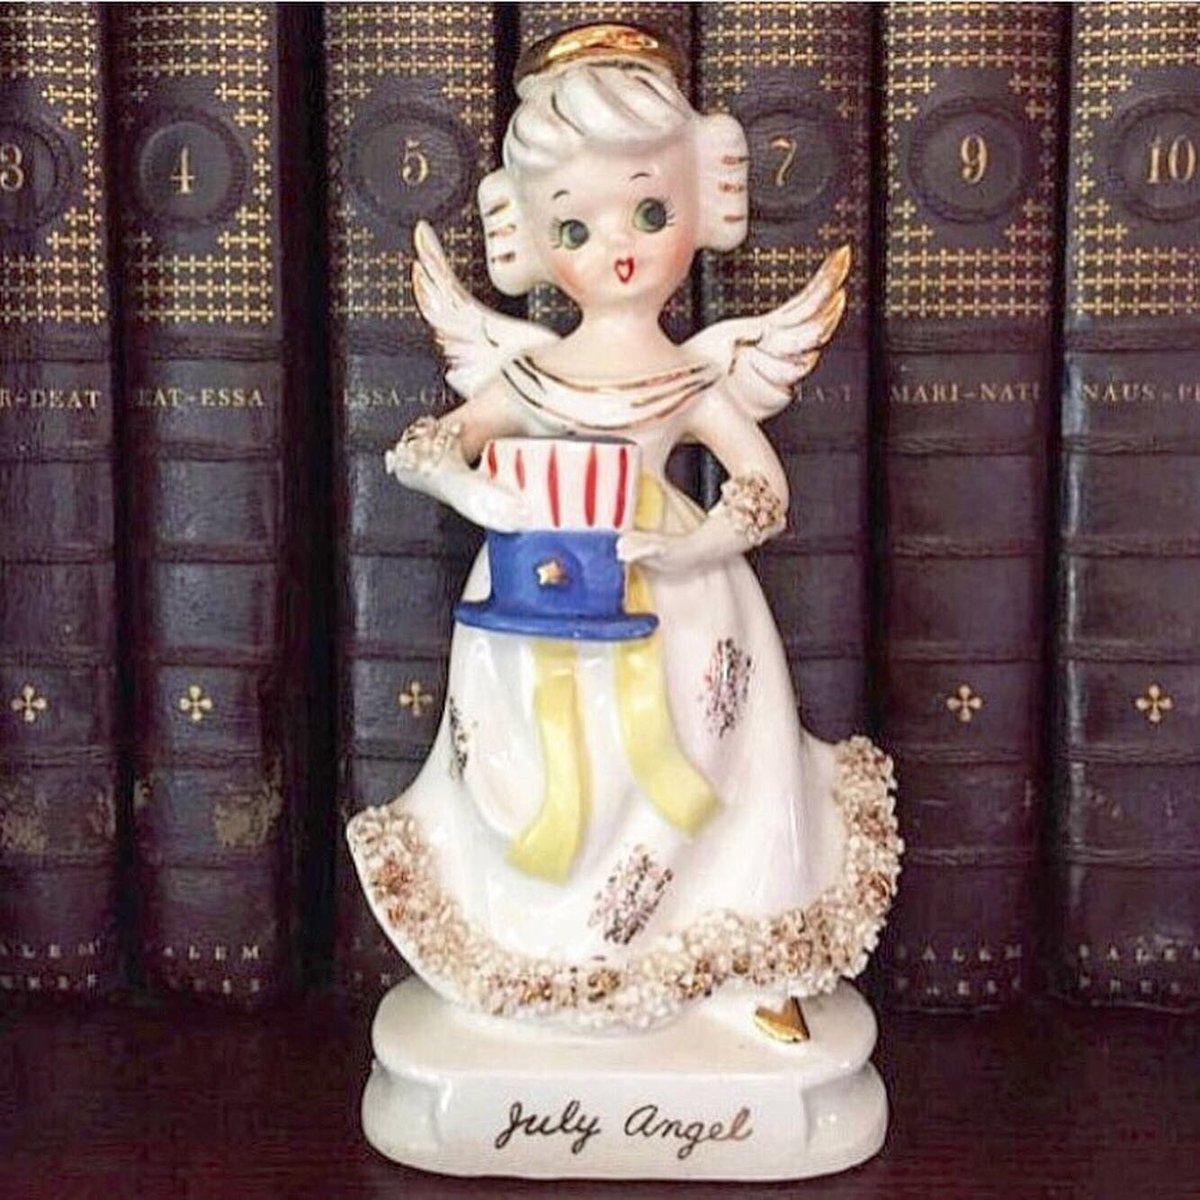 https://etsy.me/2WWwhOK All you #July babies, are ya getting ready to live it up?This pretty lil miss is!🇺🇸🥳#etsyfinds #etsyvintage #vintage #vintagehome #gotvintage #julybirthday #julybaby #birthdayangel #angelofthemonth #julyangel #ceramicangel #porcelainangel #angelfigurine